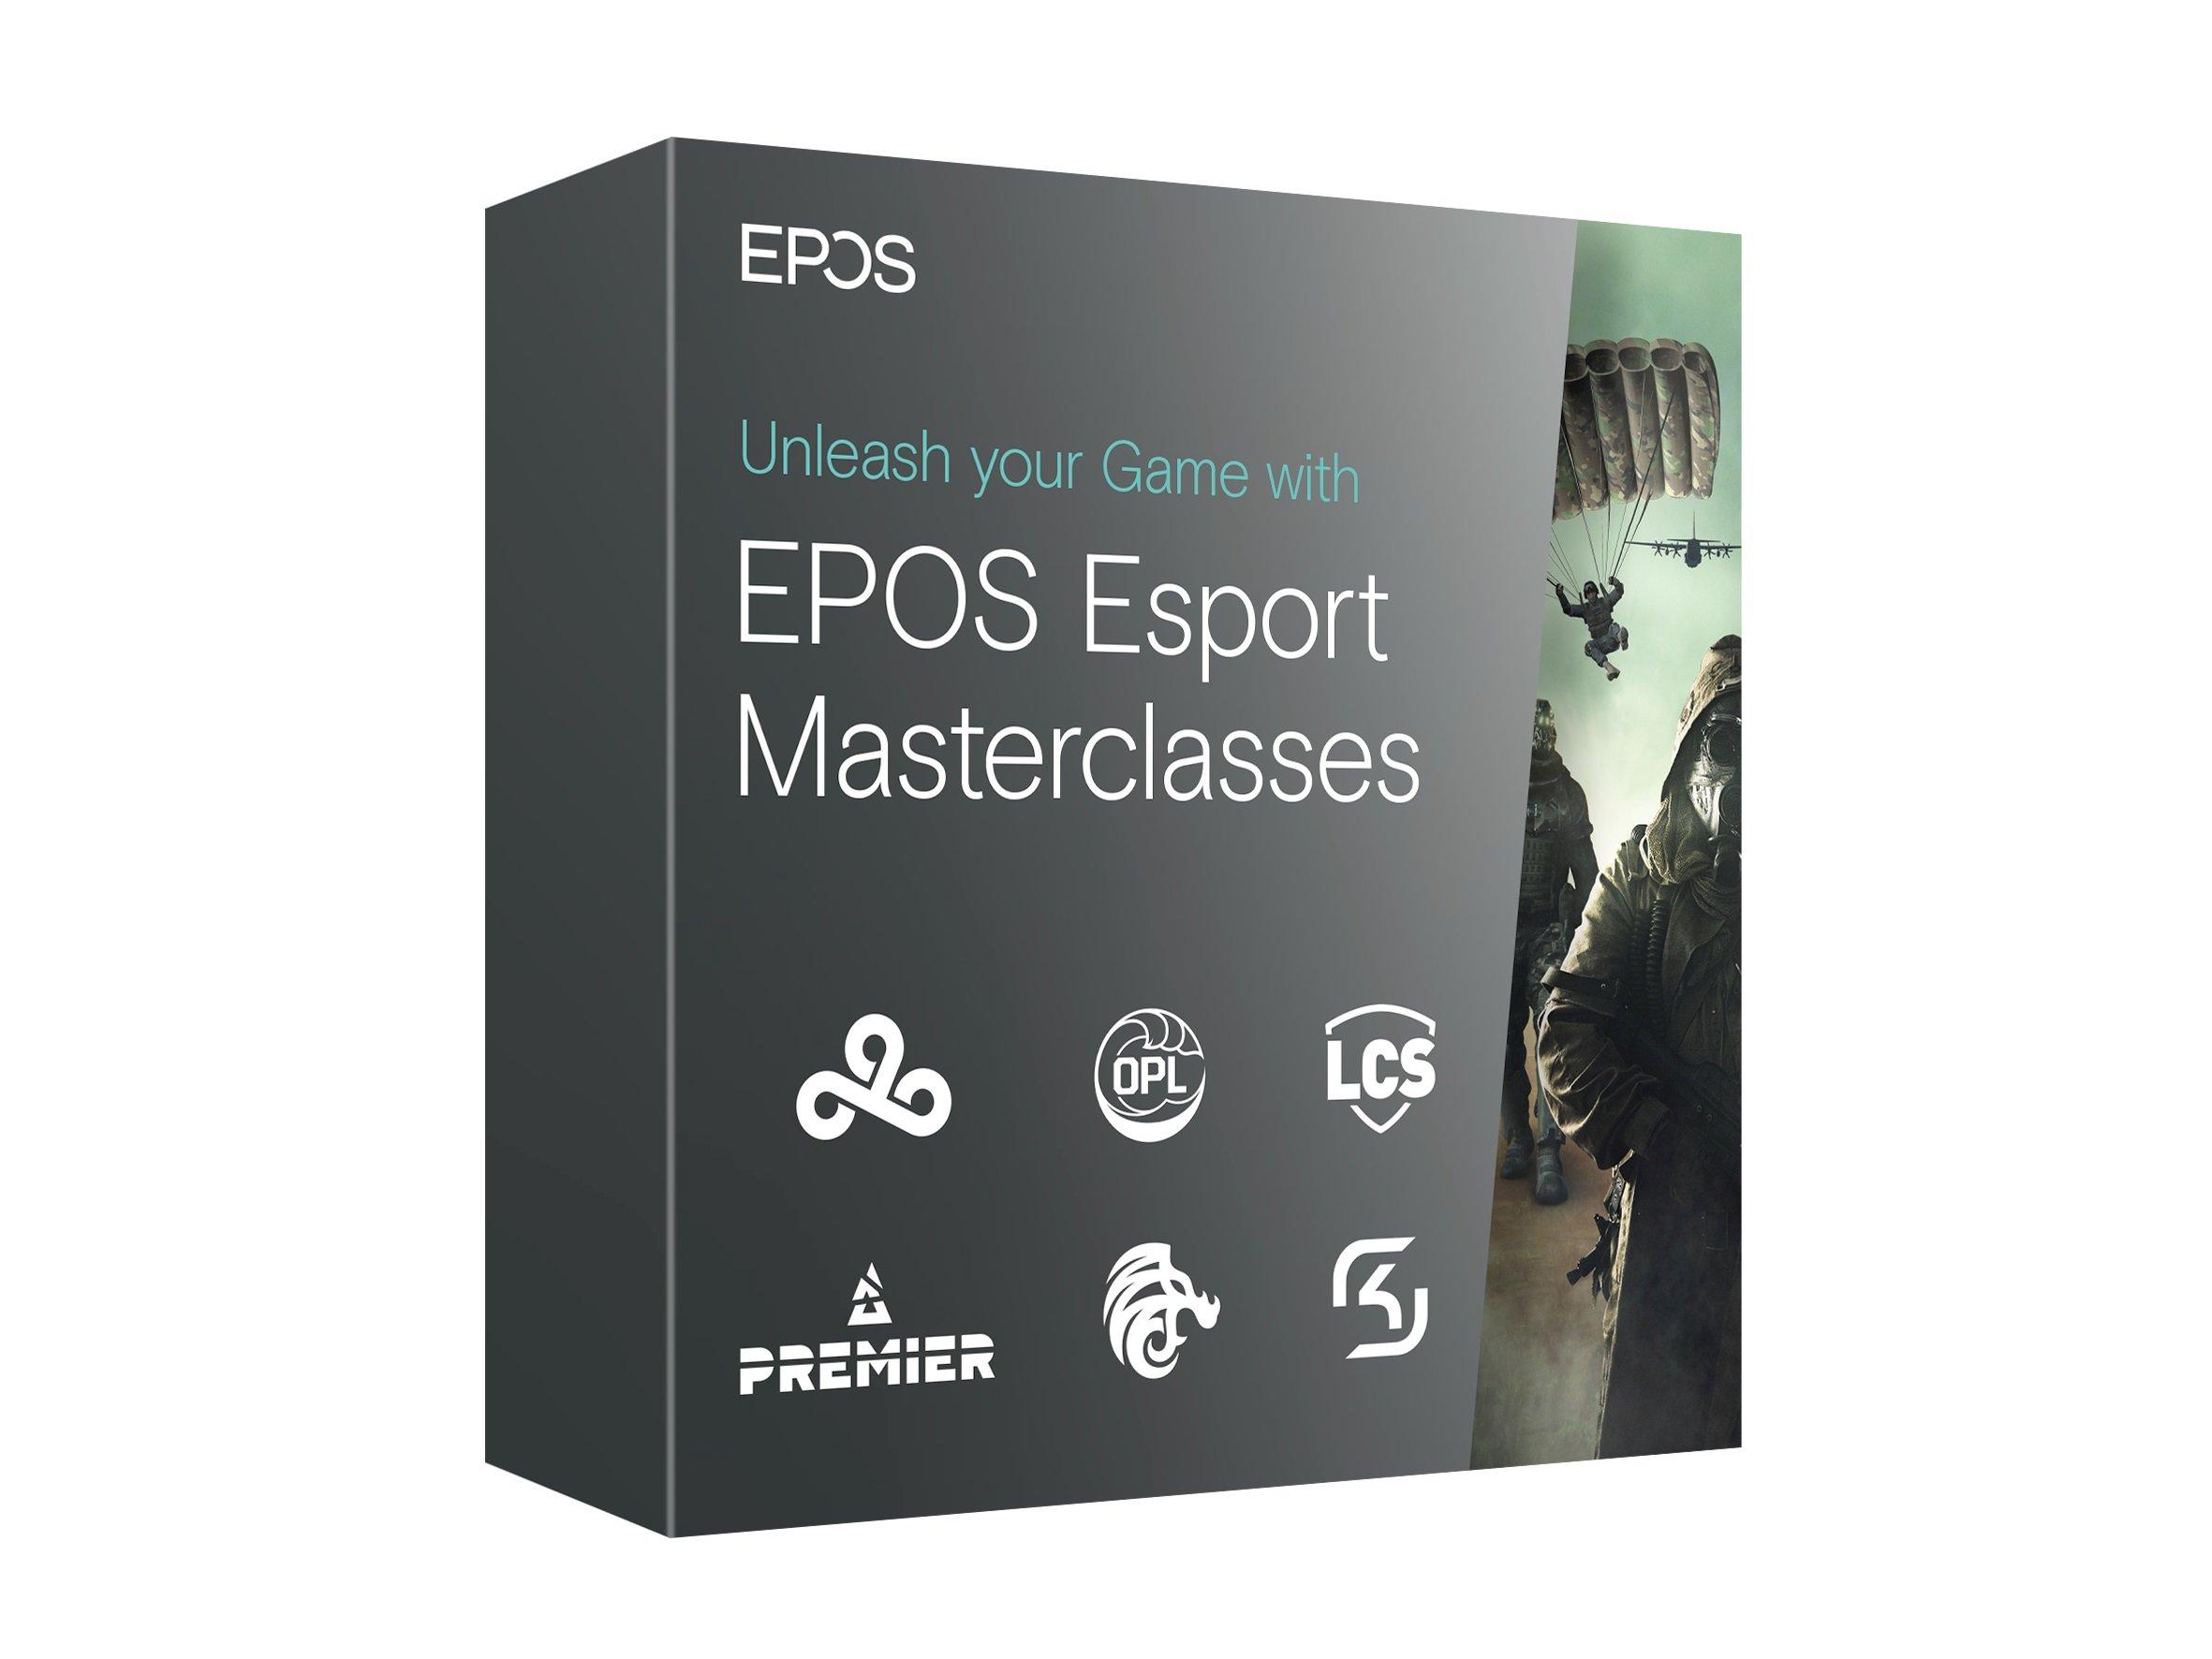 EPOS Masterclass Esports Event tickets win contest learn esports